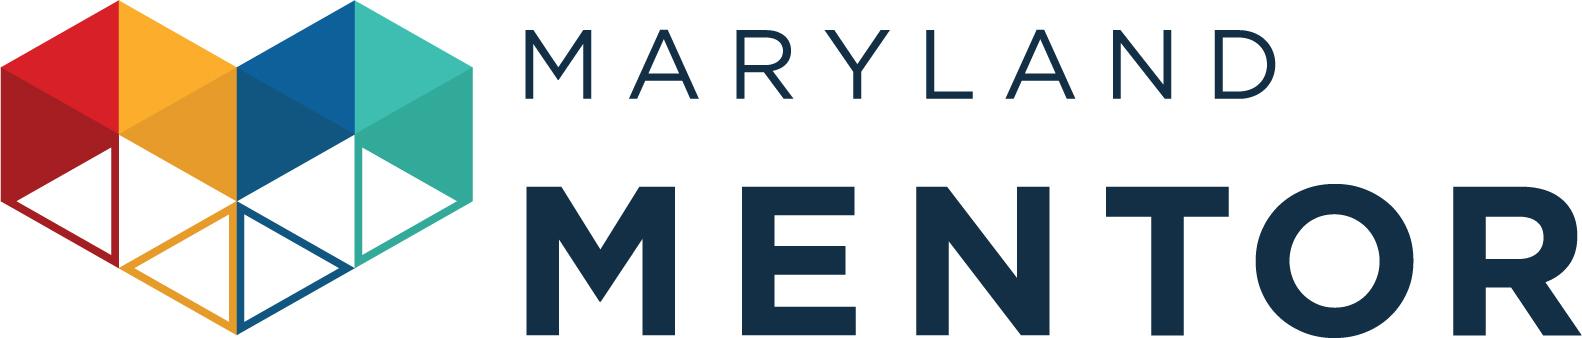 Maryland-Mentor-Logo